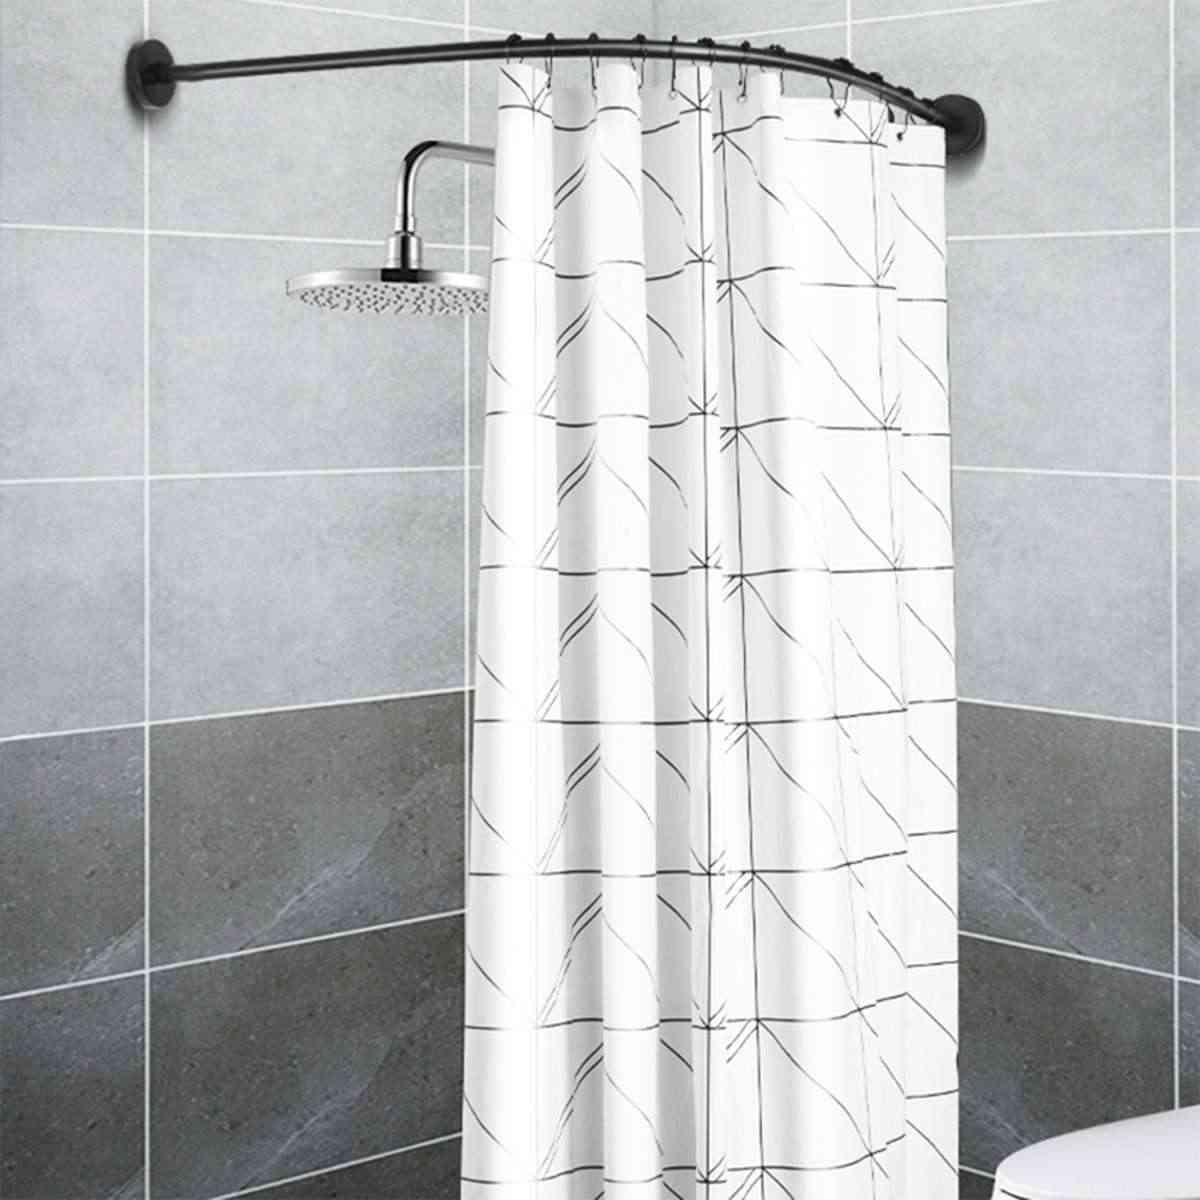 Extendable Corner Shower Curtain Rod Pole, Stainless Steel Rail Bar, Bath Door, Hardware Heavy Loaded With Metal Hooks